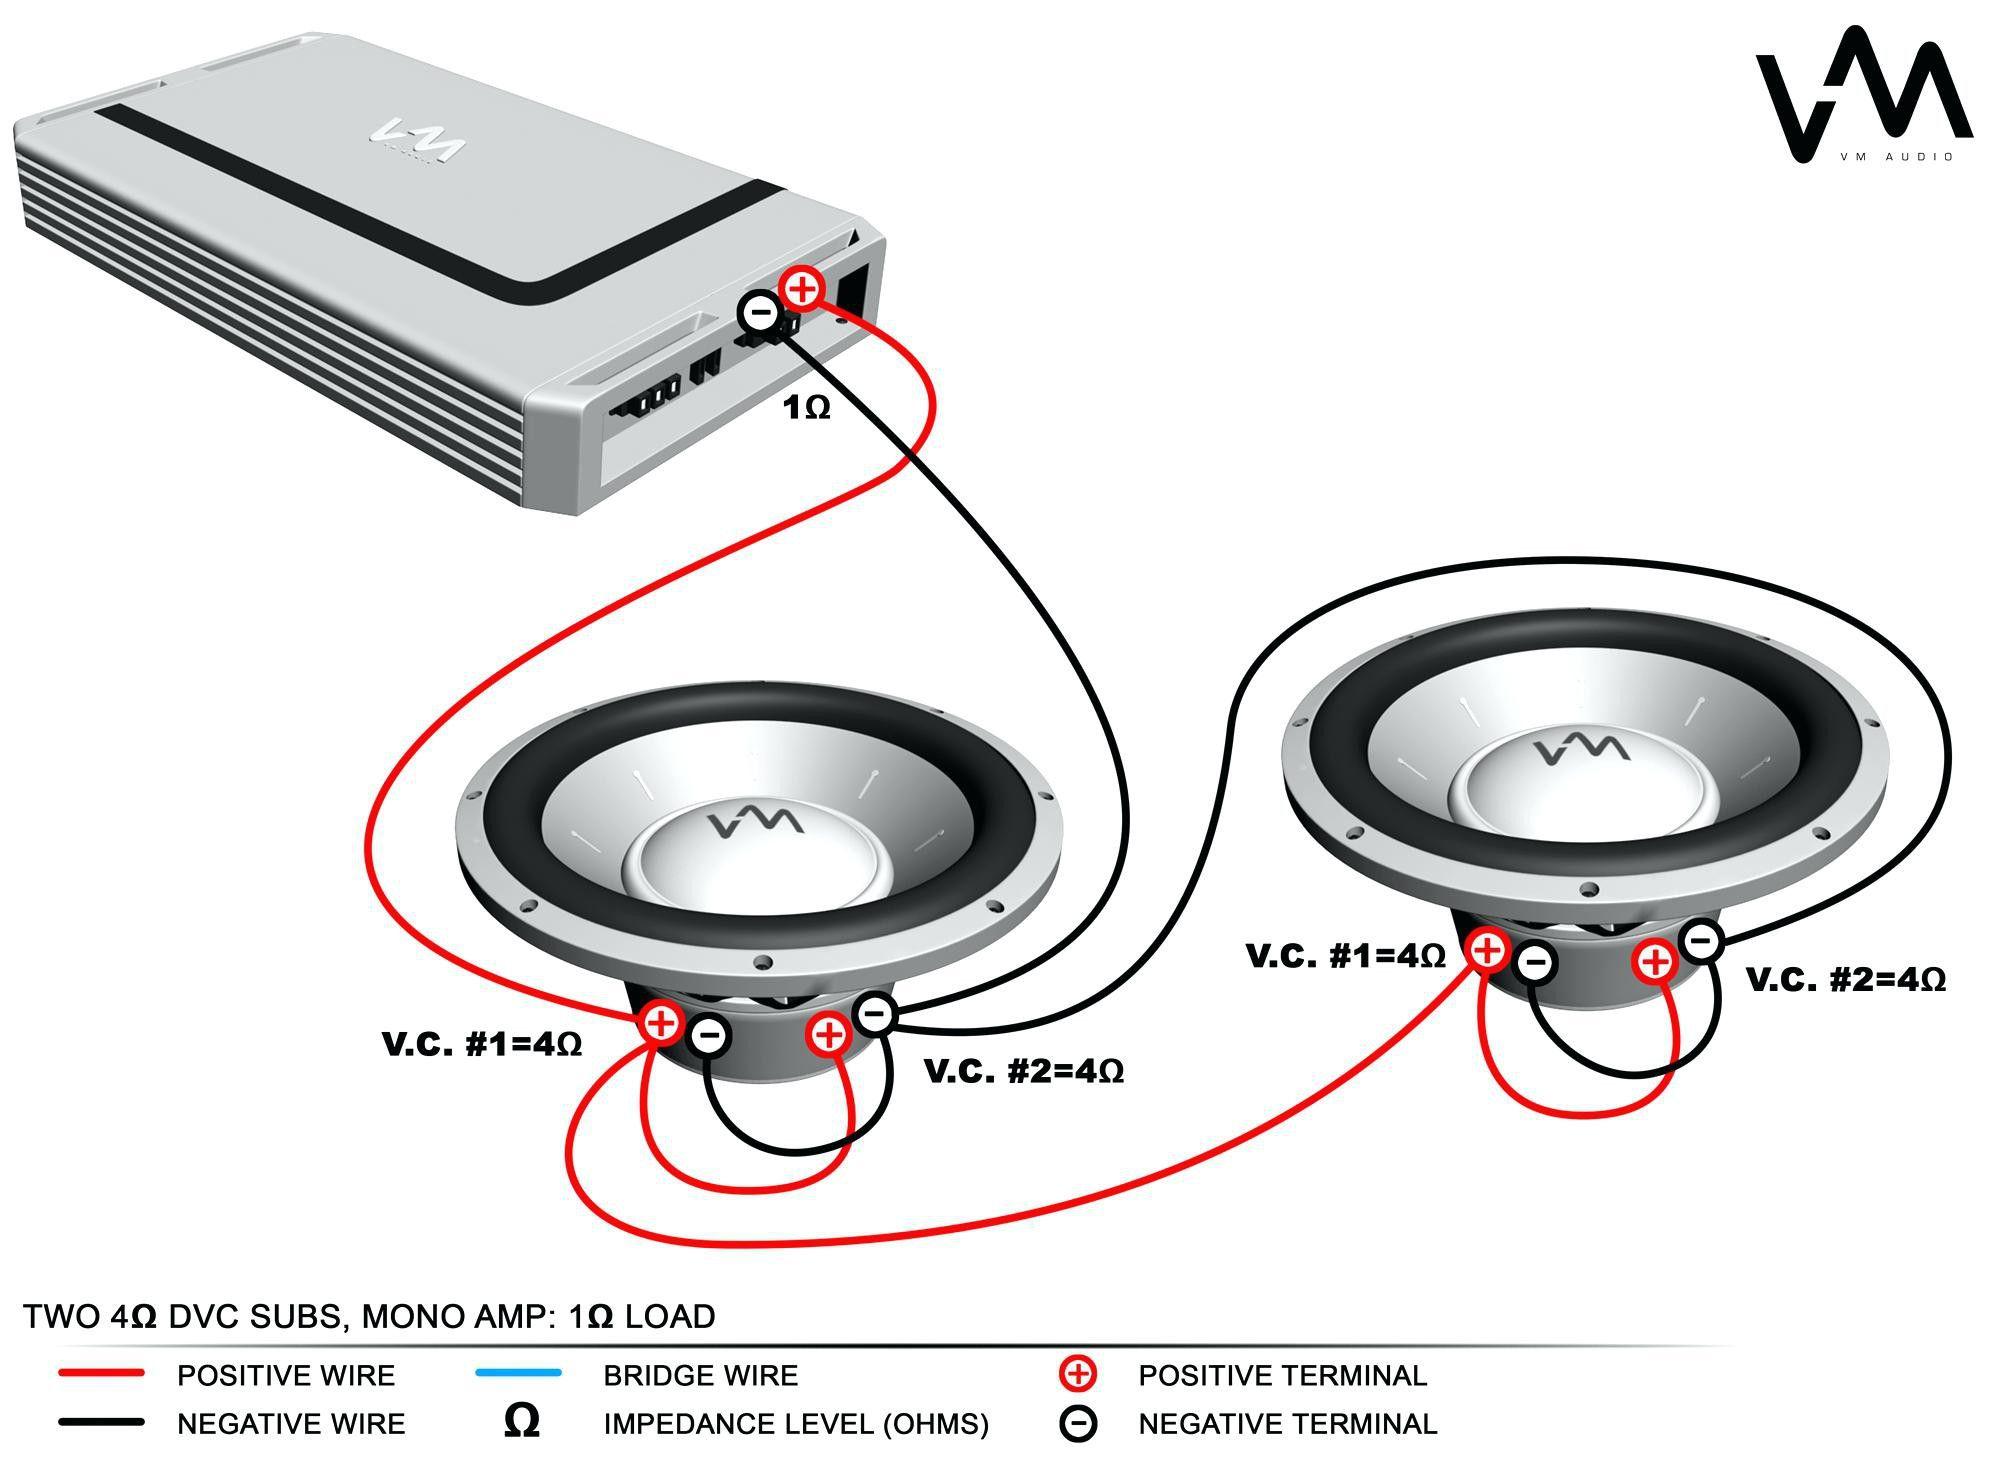 medium resolution of 1 ohm sub wiring diagram blogs throughout dual speaker speaker wiring diagram 1ohm